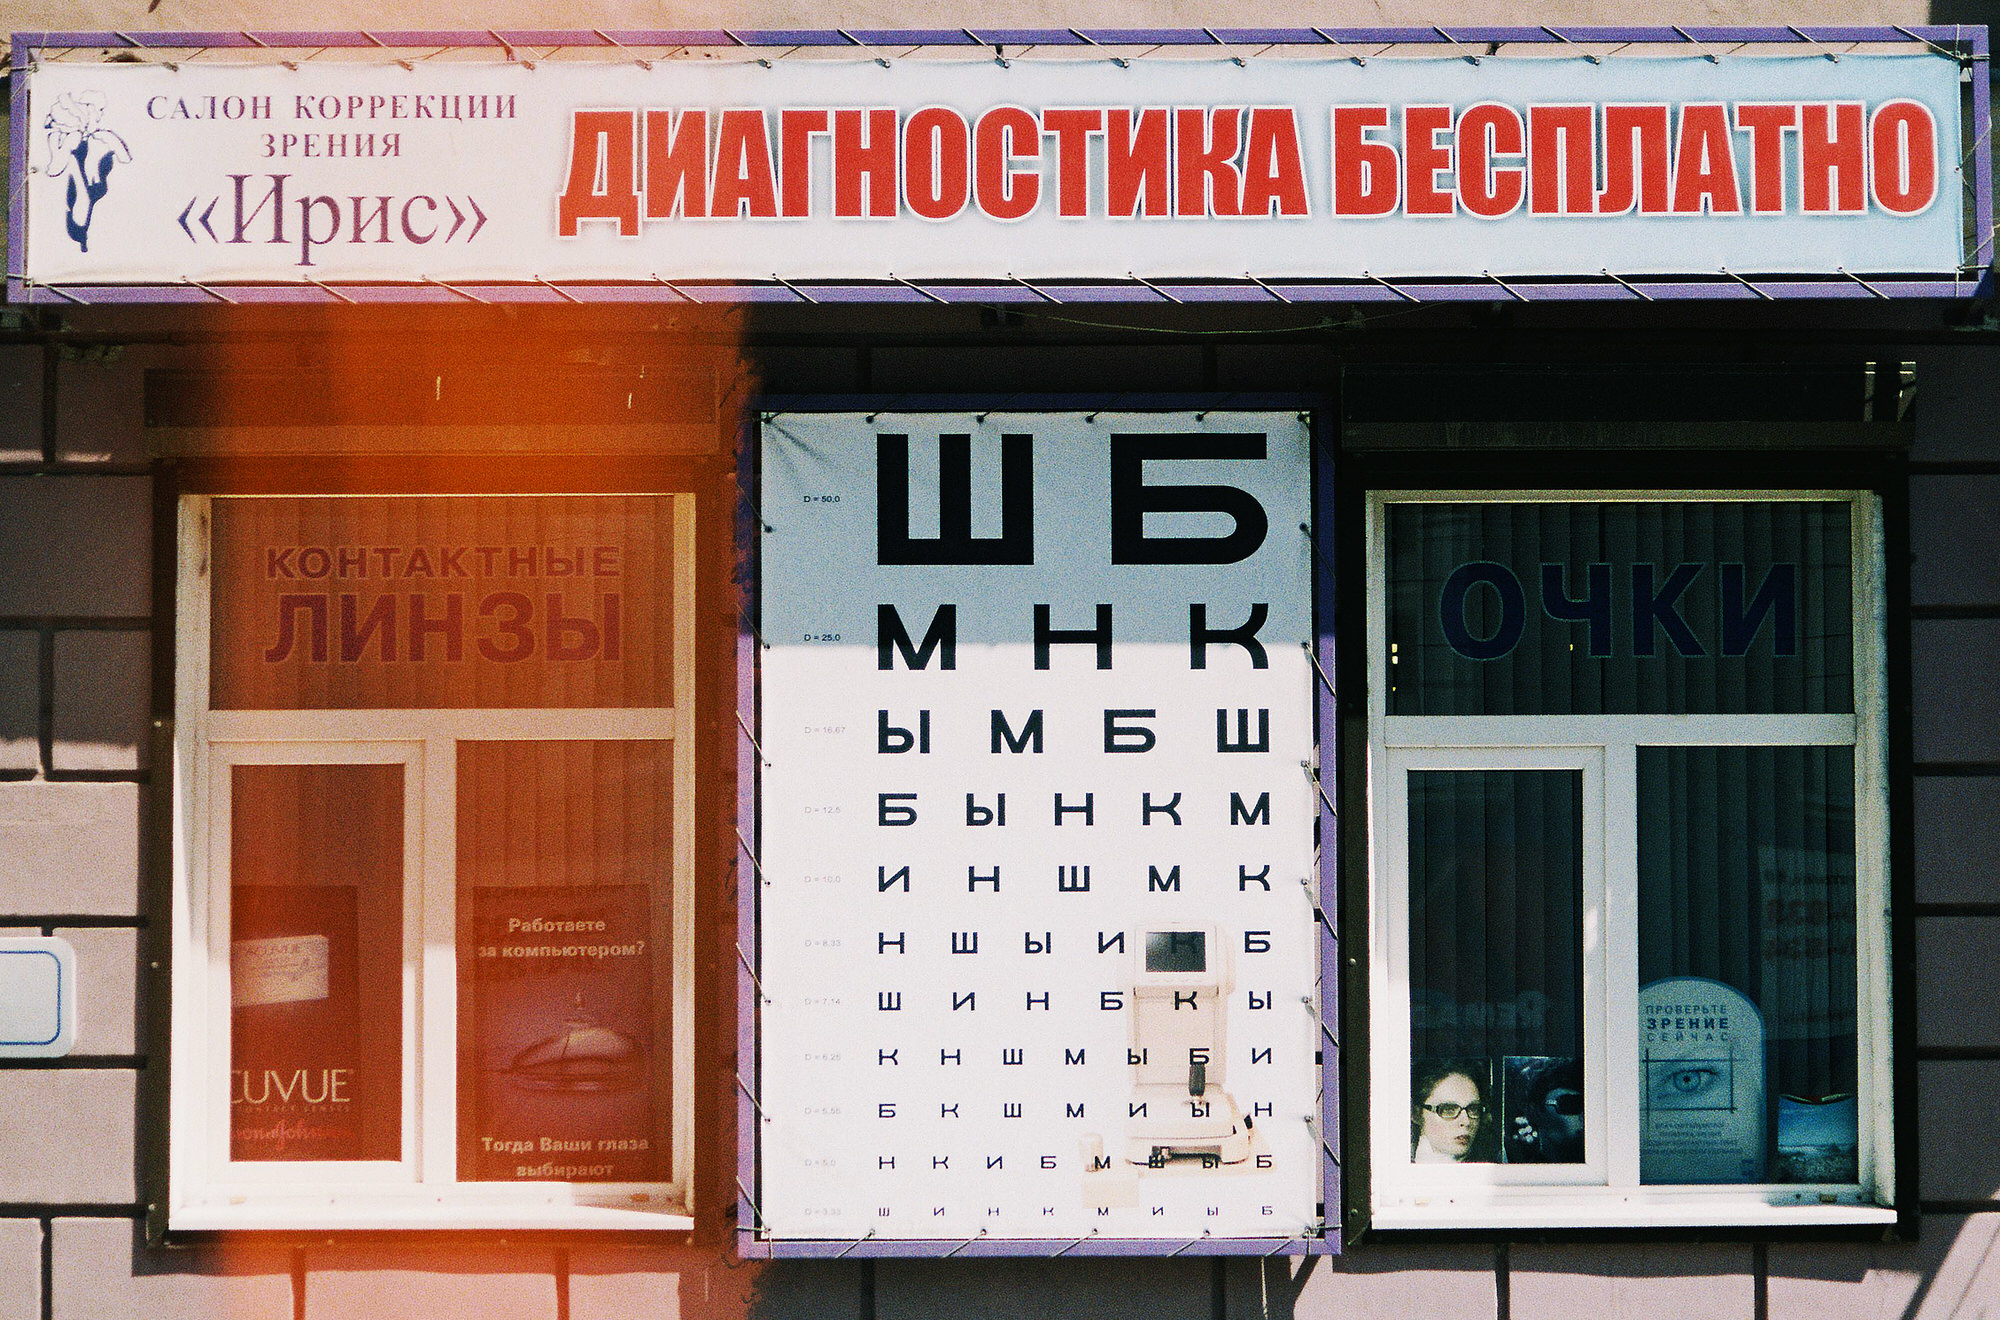 35mmPatrikWallner_Irkusk_CanYouSee2LOWQ2-1